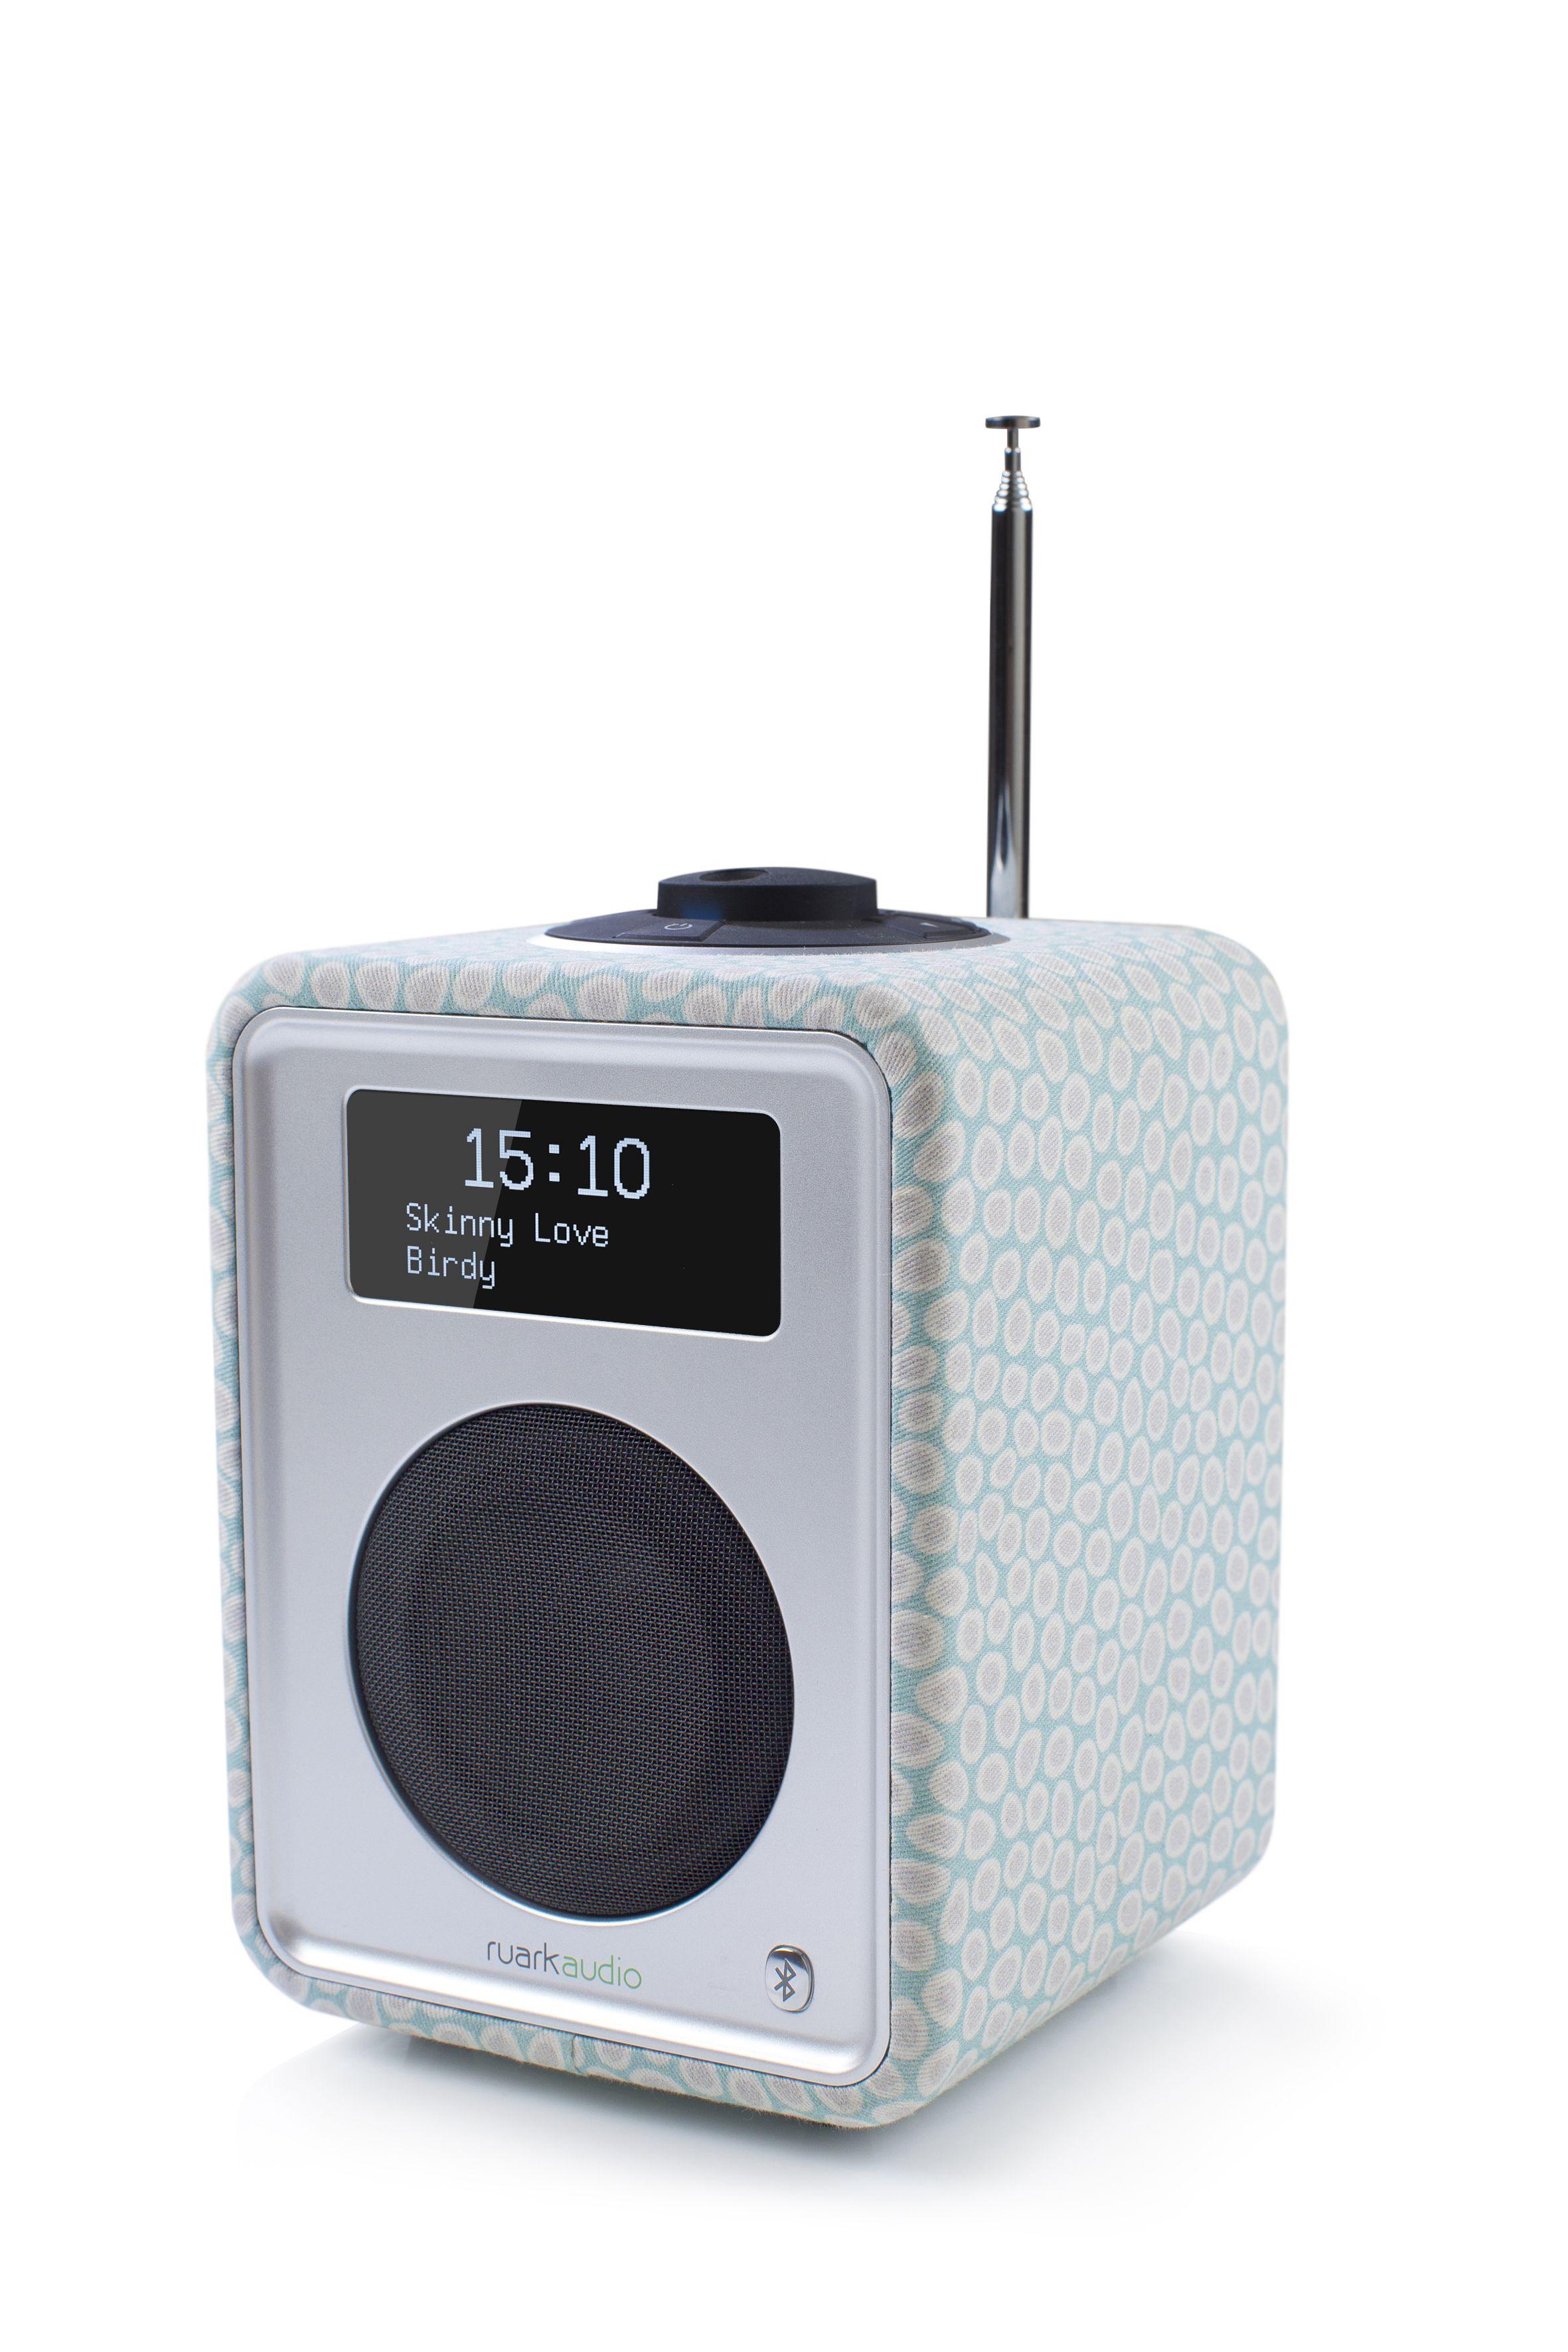 R1 MK3 Osborne & Little luxury kitchen radio with crystal clear OLED ...